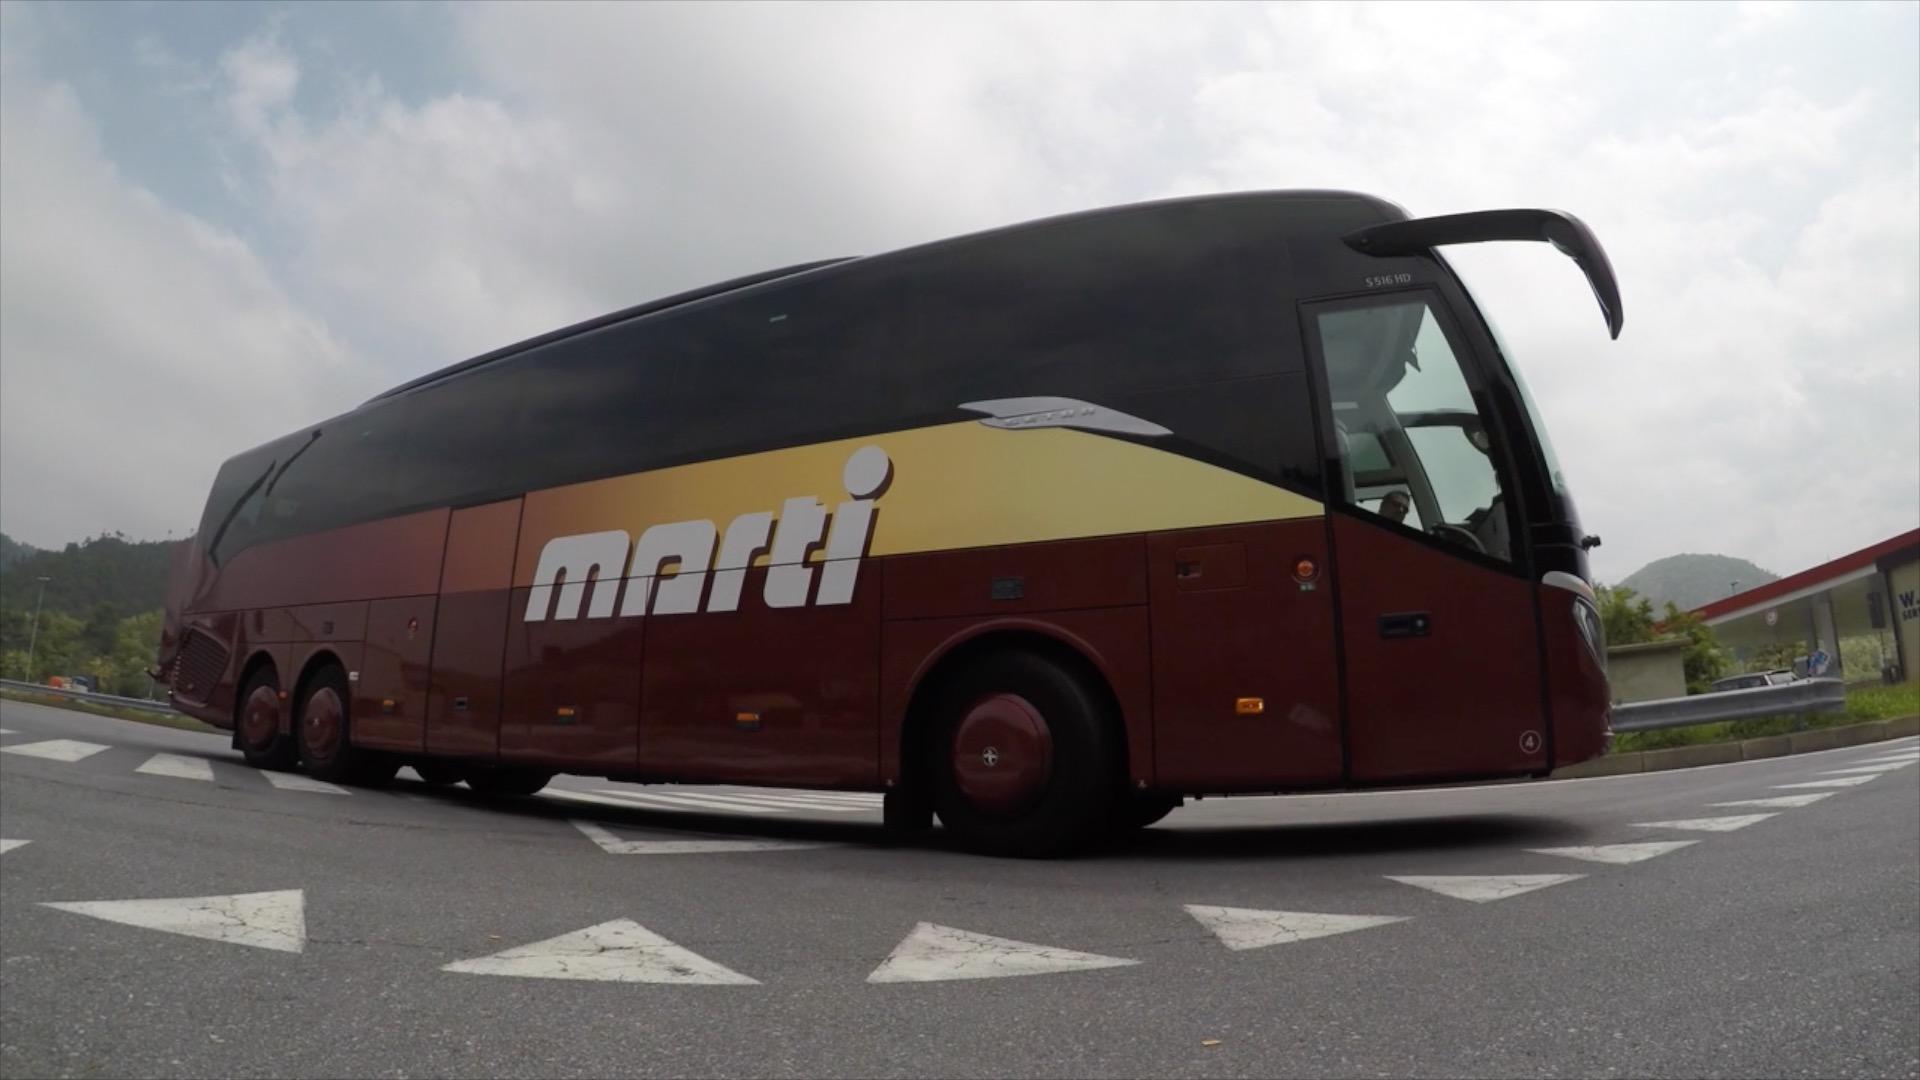 Marti-Kreuzfahrt 2017 Bild 3